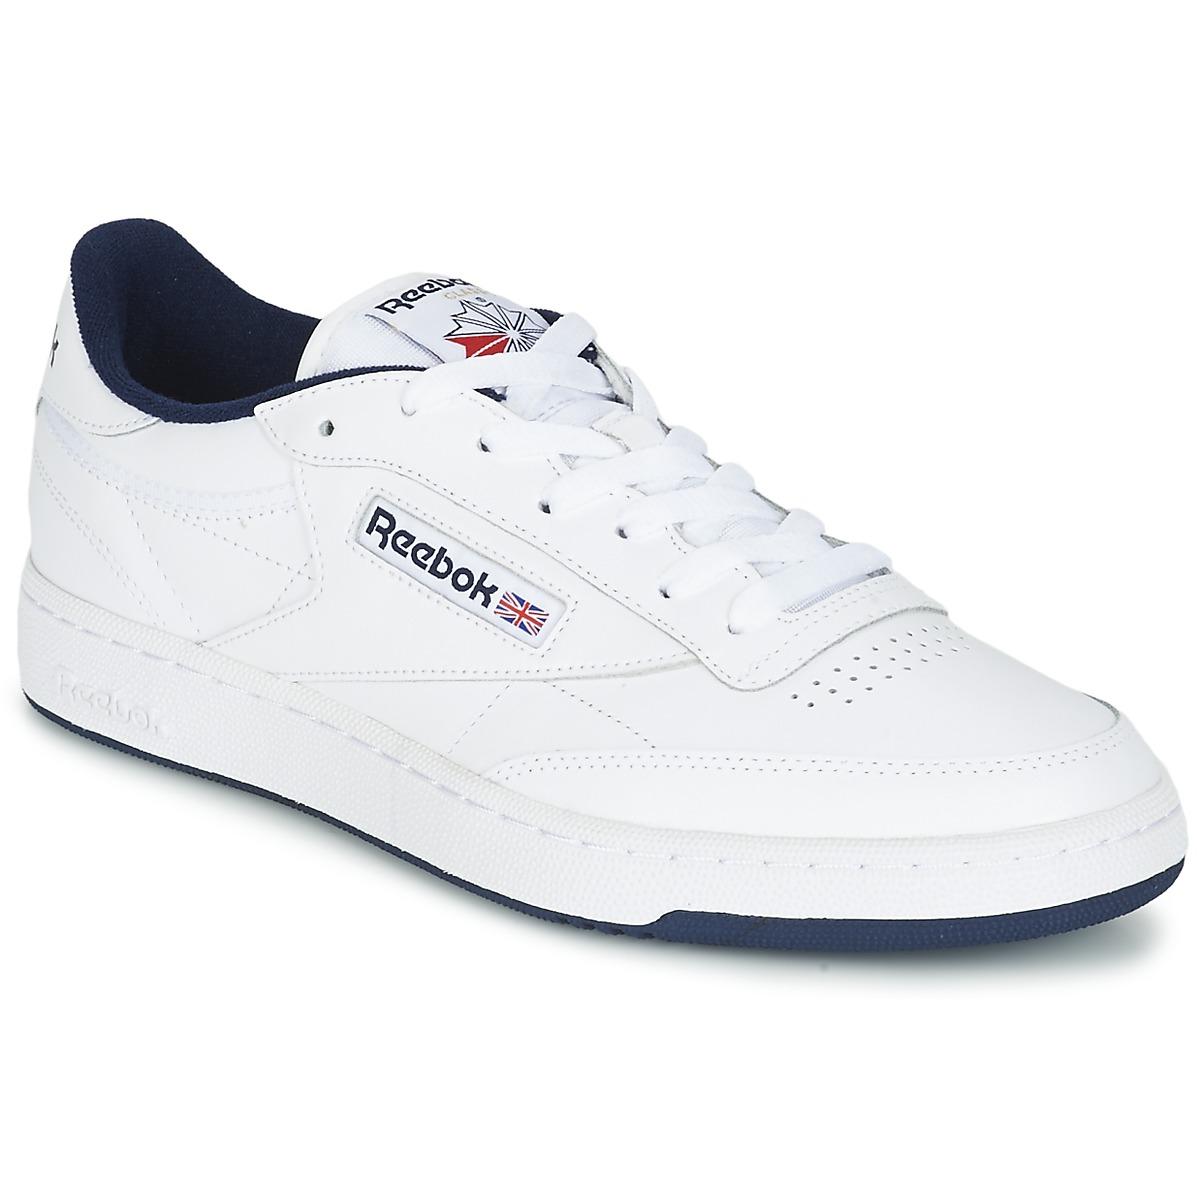 Reebok Classic CLUB C 85 White Blue Shoes Low top trainers Men 70 ... 33748cf82